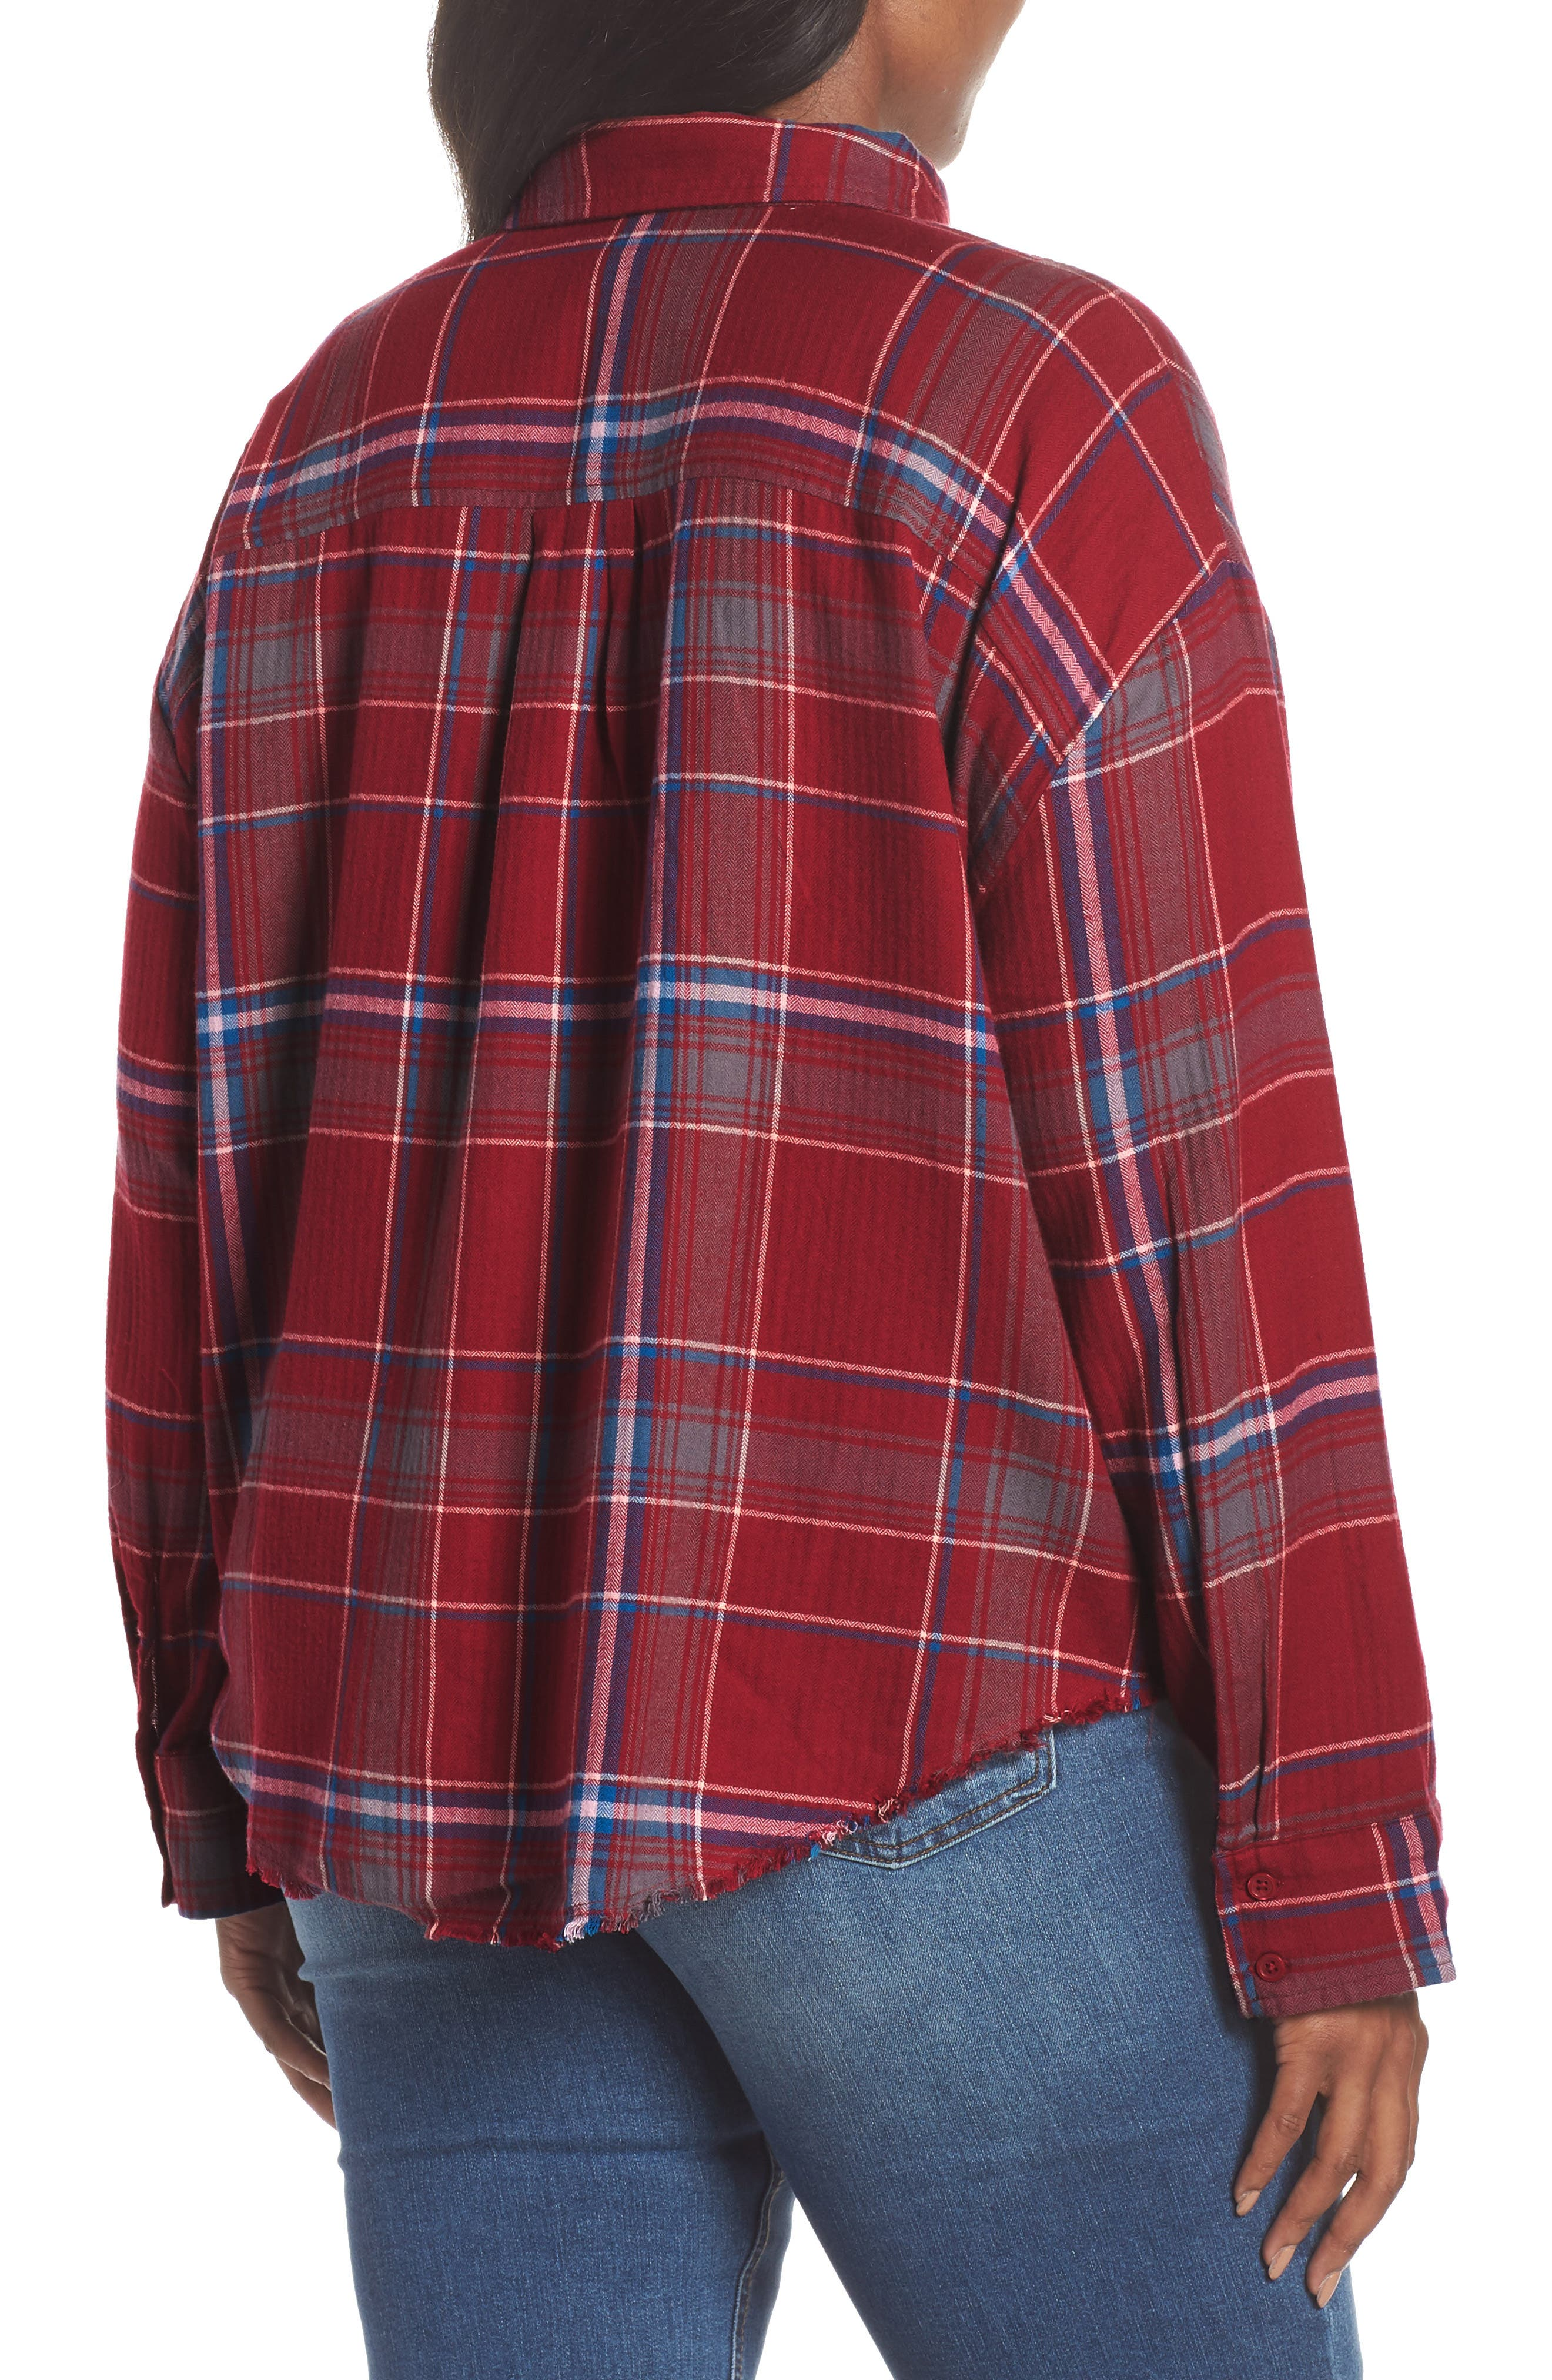 Frayed Edge Plaid Shirt,                             Alternate thumbnail 9, color,                             RED RUMBA NICOLE PLAID